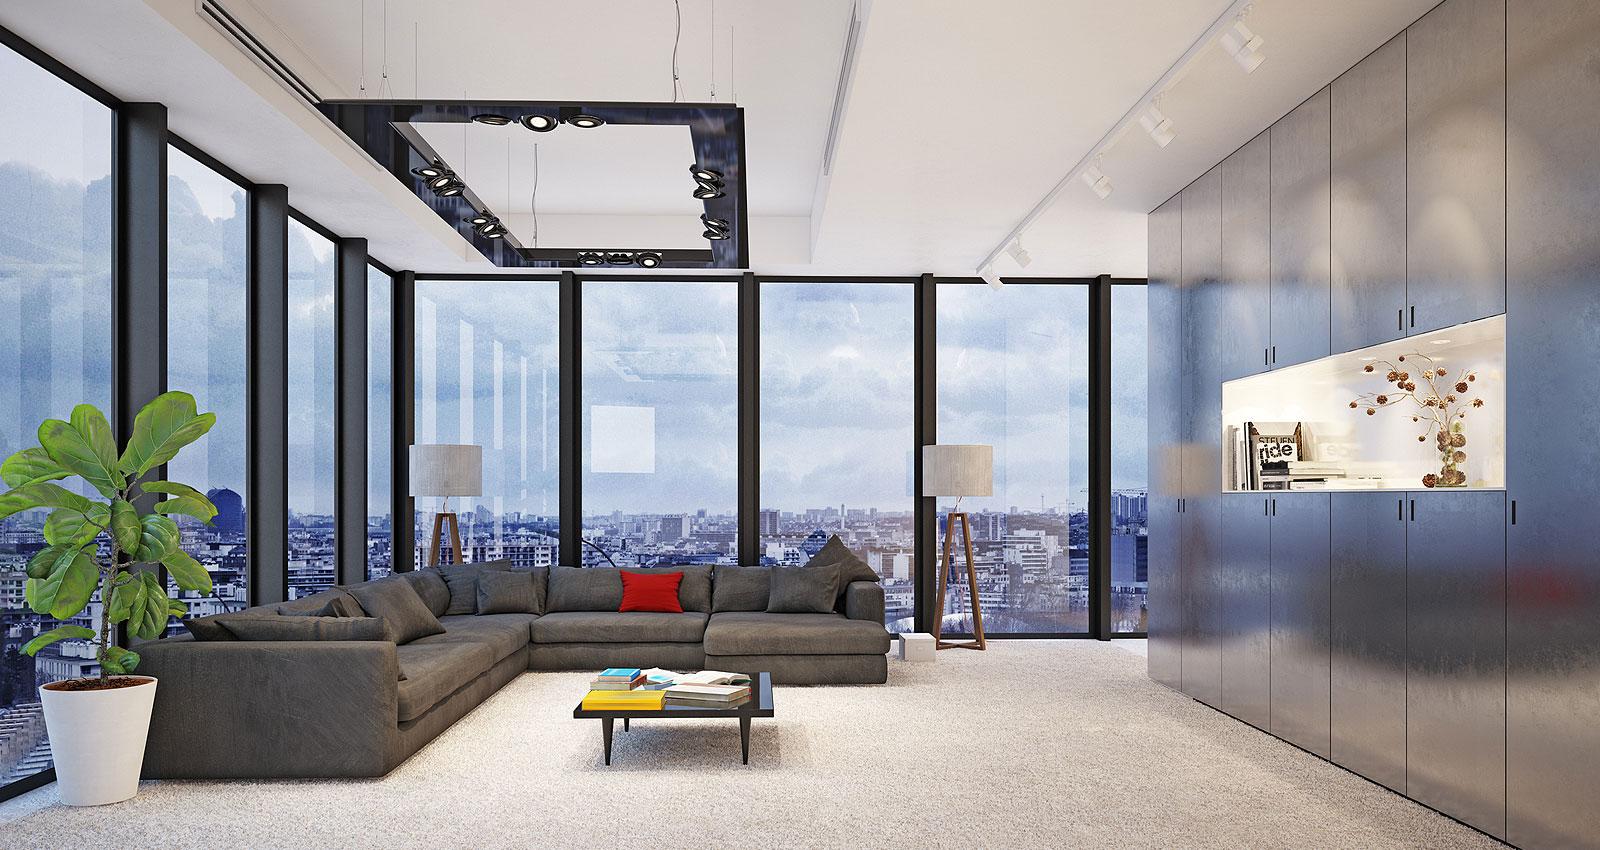 minimalist living room in a condo unit in San Diego, CA